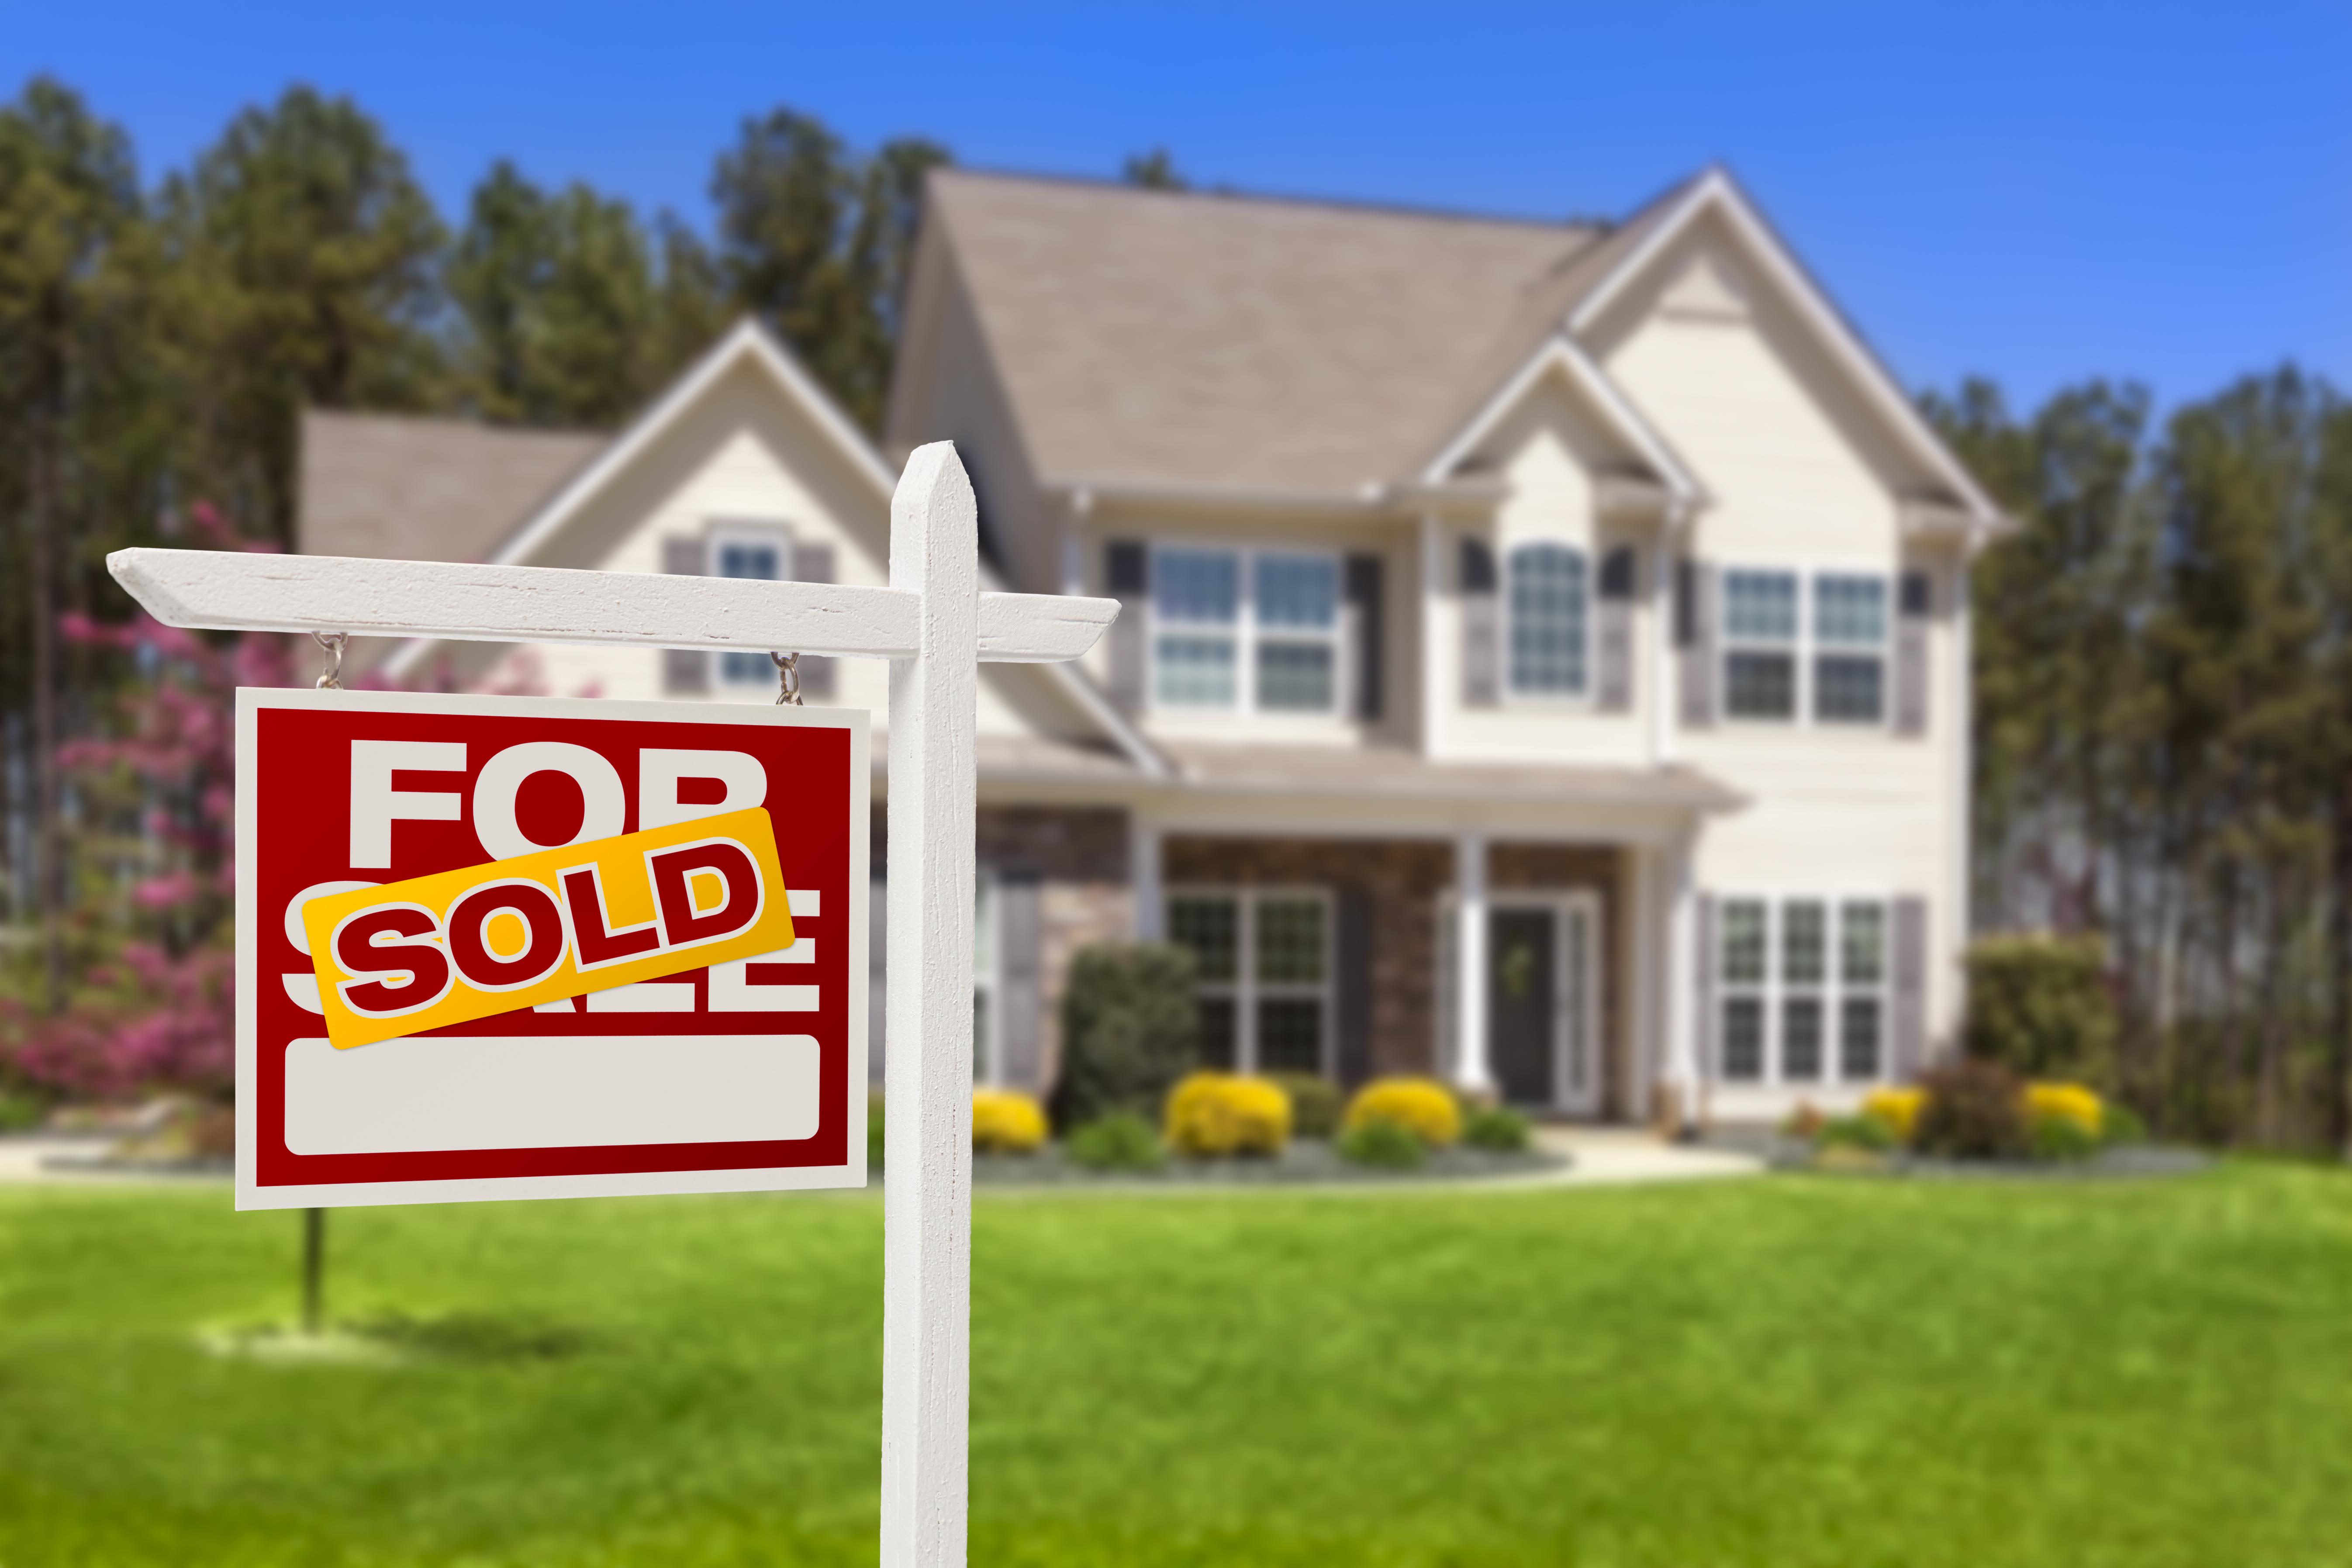 Homes For Sale in Grantsville, Utah